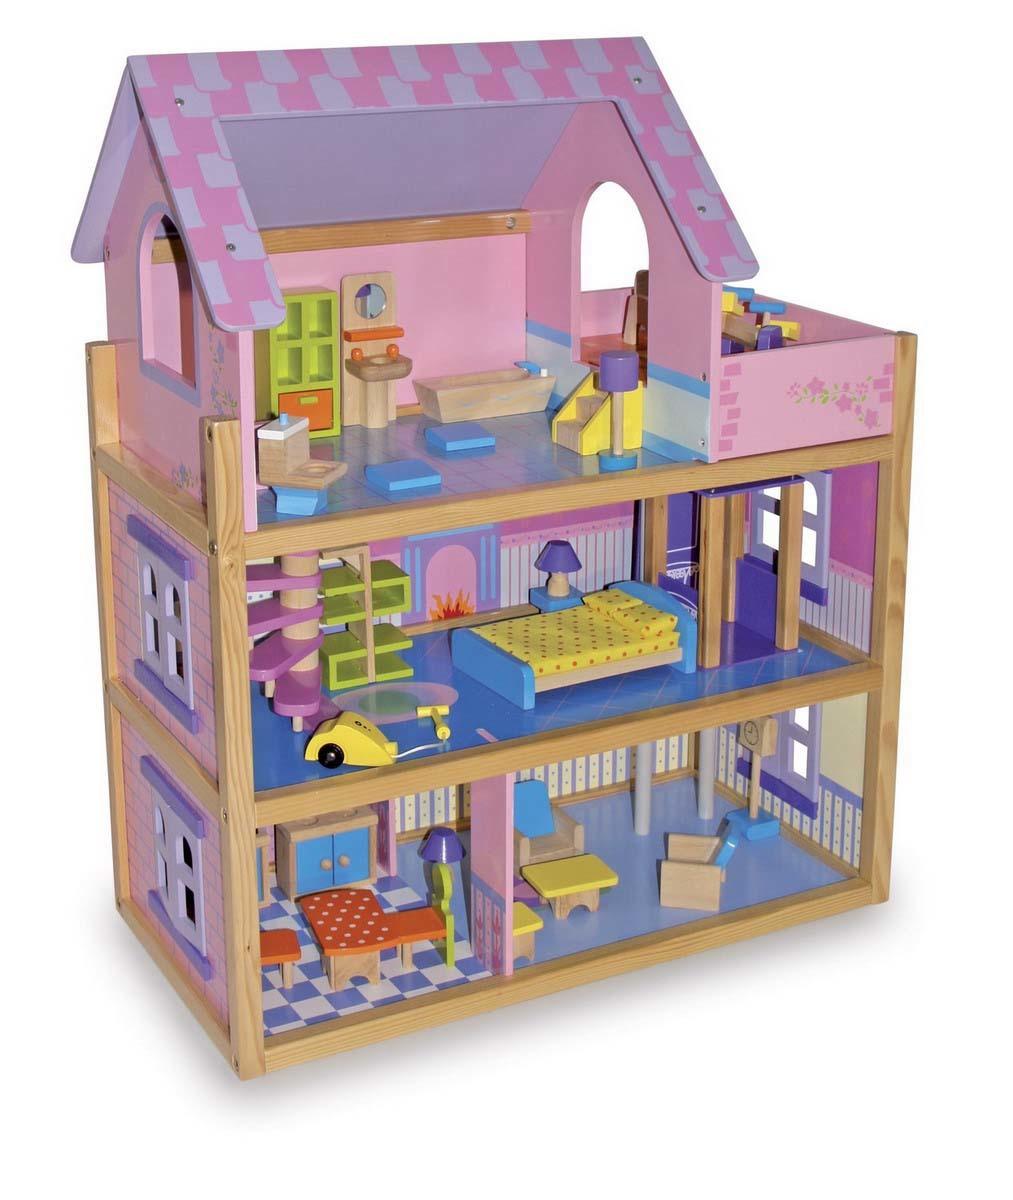 Small Foot Legler Dolls House Pink Hktvmall Online Shopping